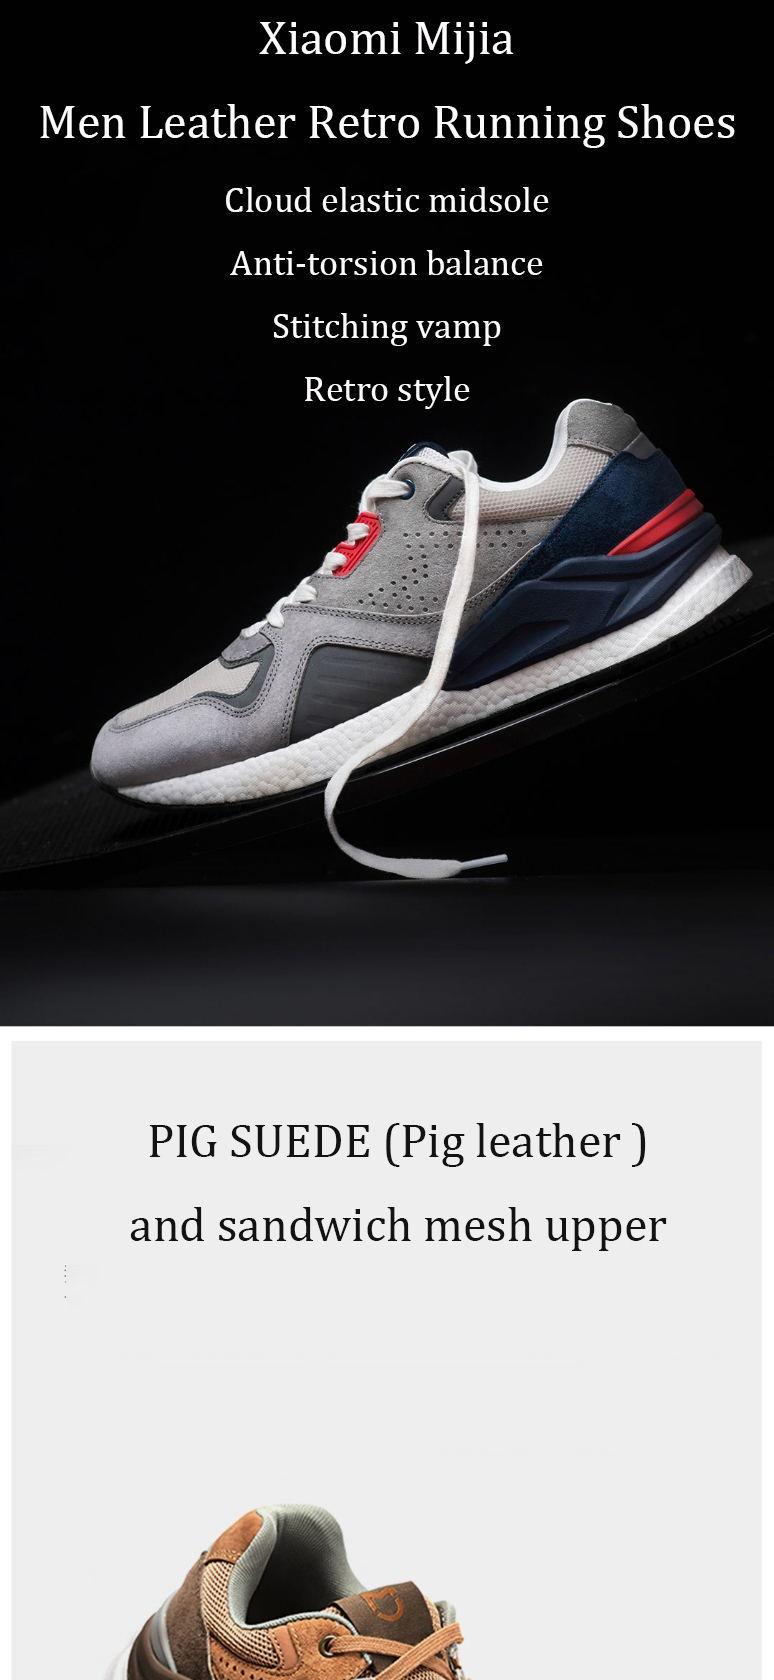 buy xiaomi mijia leather sneakers